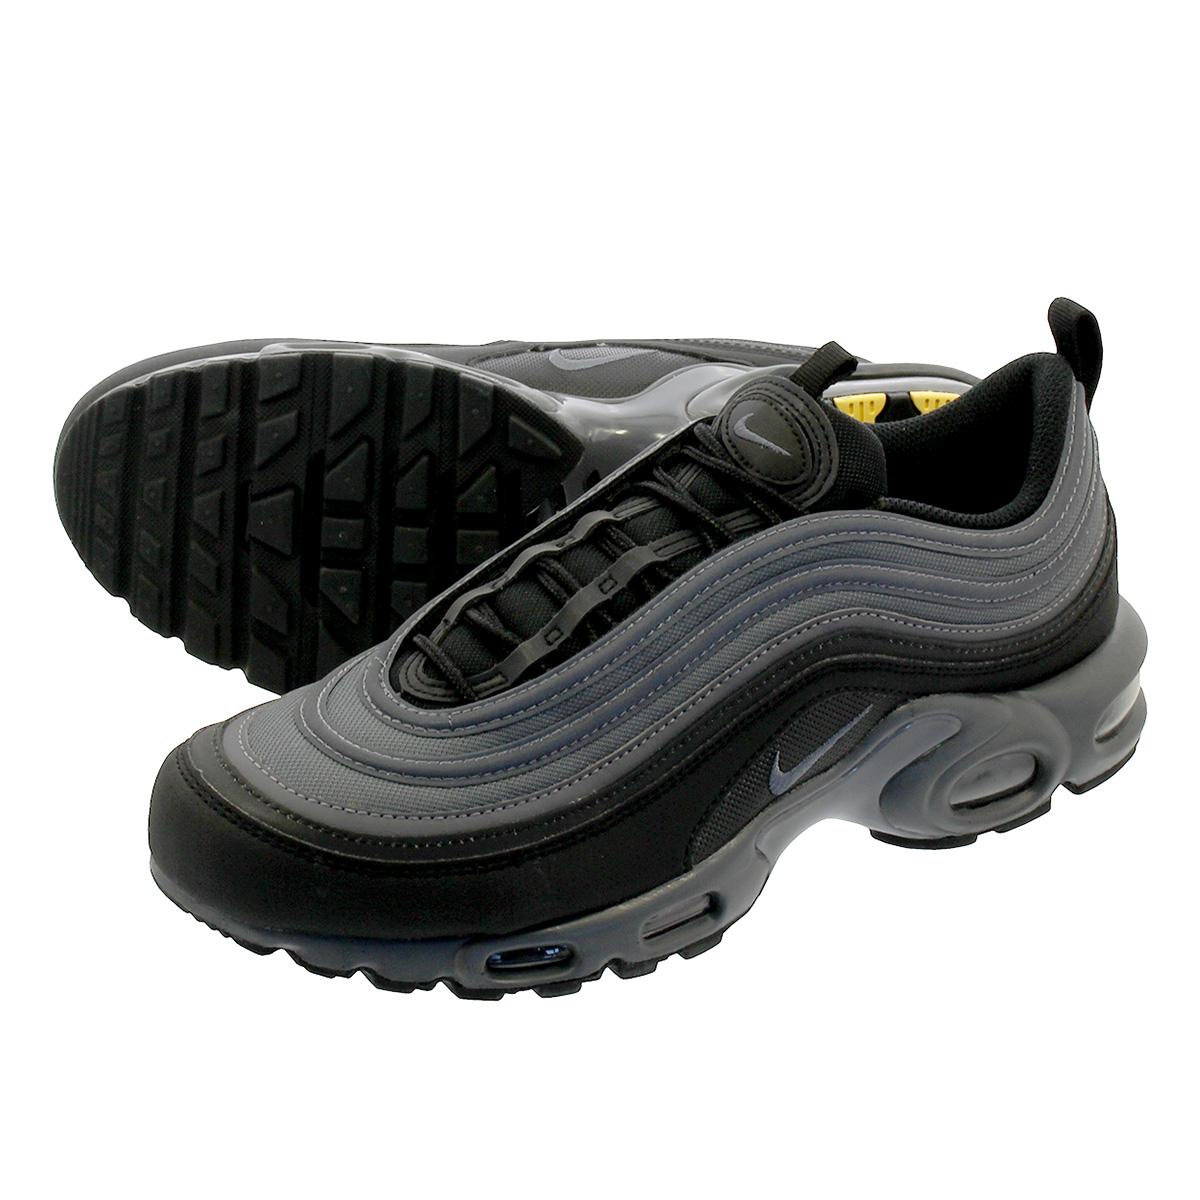 sports shoes 8fdc7 7f20f NIKE AIR MAX PLUS 97 Kie Ney AMAX +97 COOL GREY/PURE PLATINUM cd7859-001